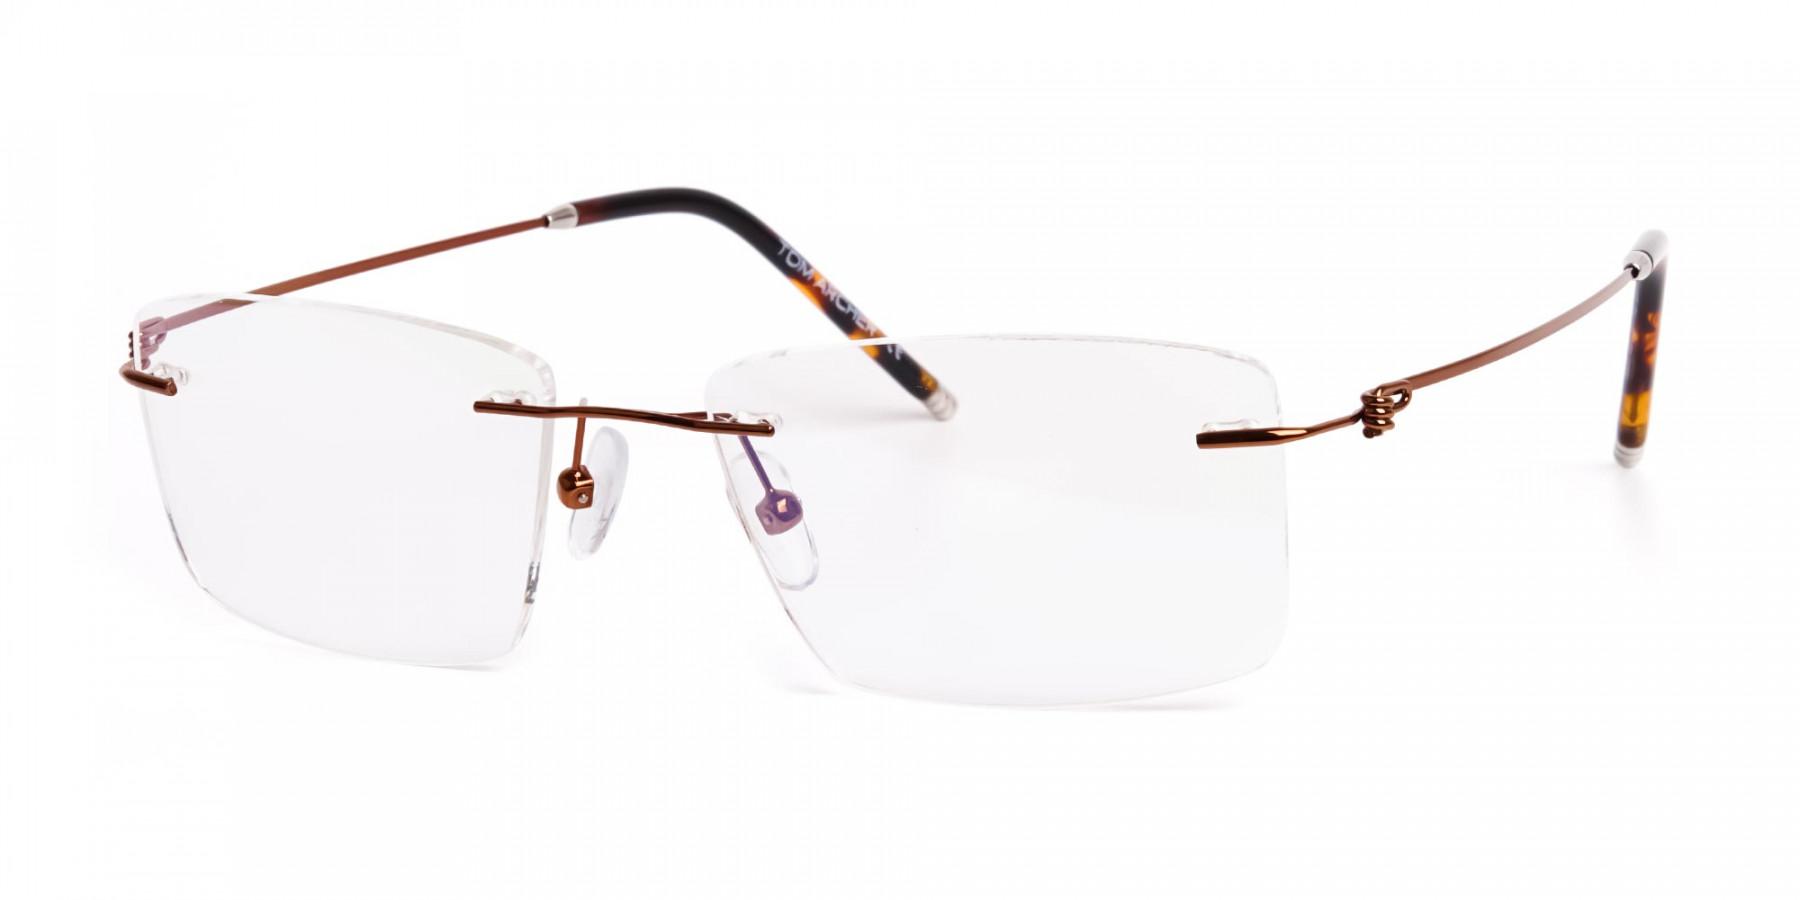 brown-rectangular-rimless-titanium-glasses-frames-1